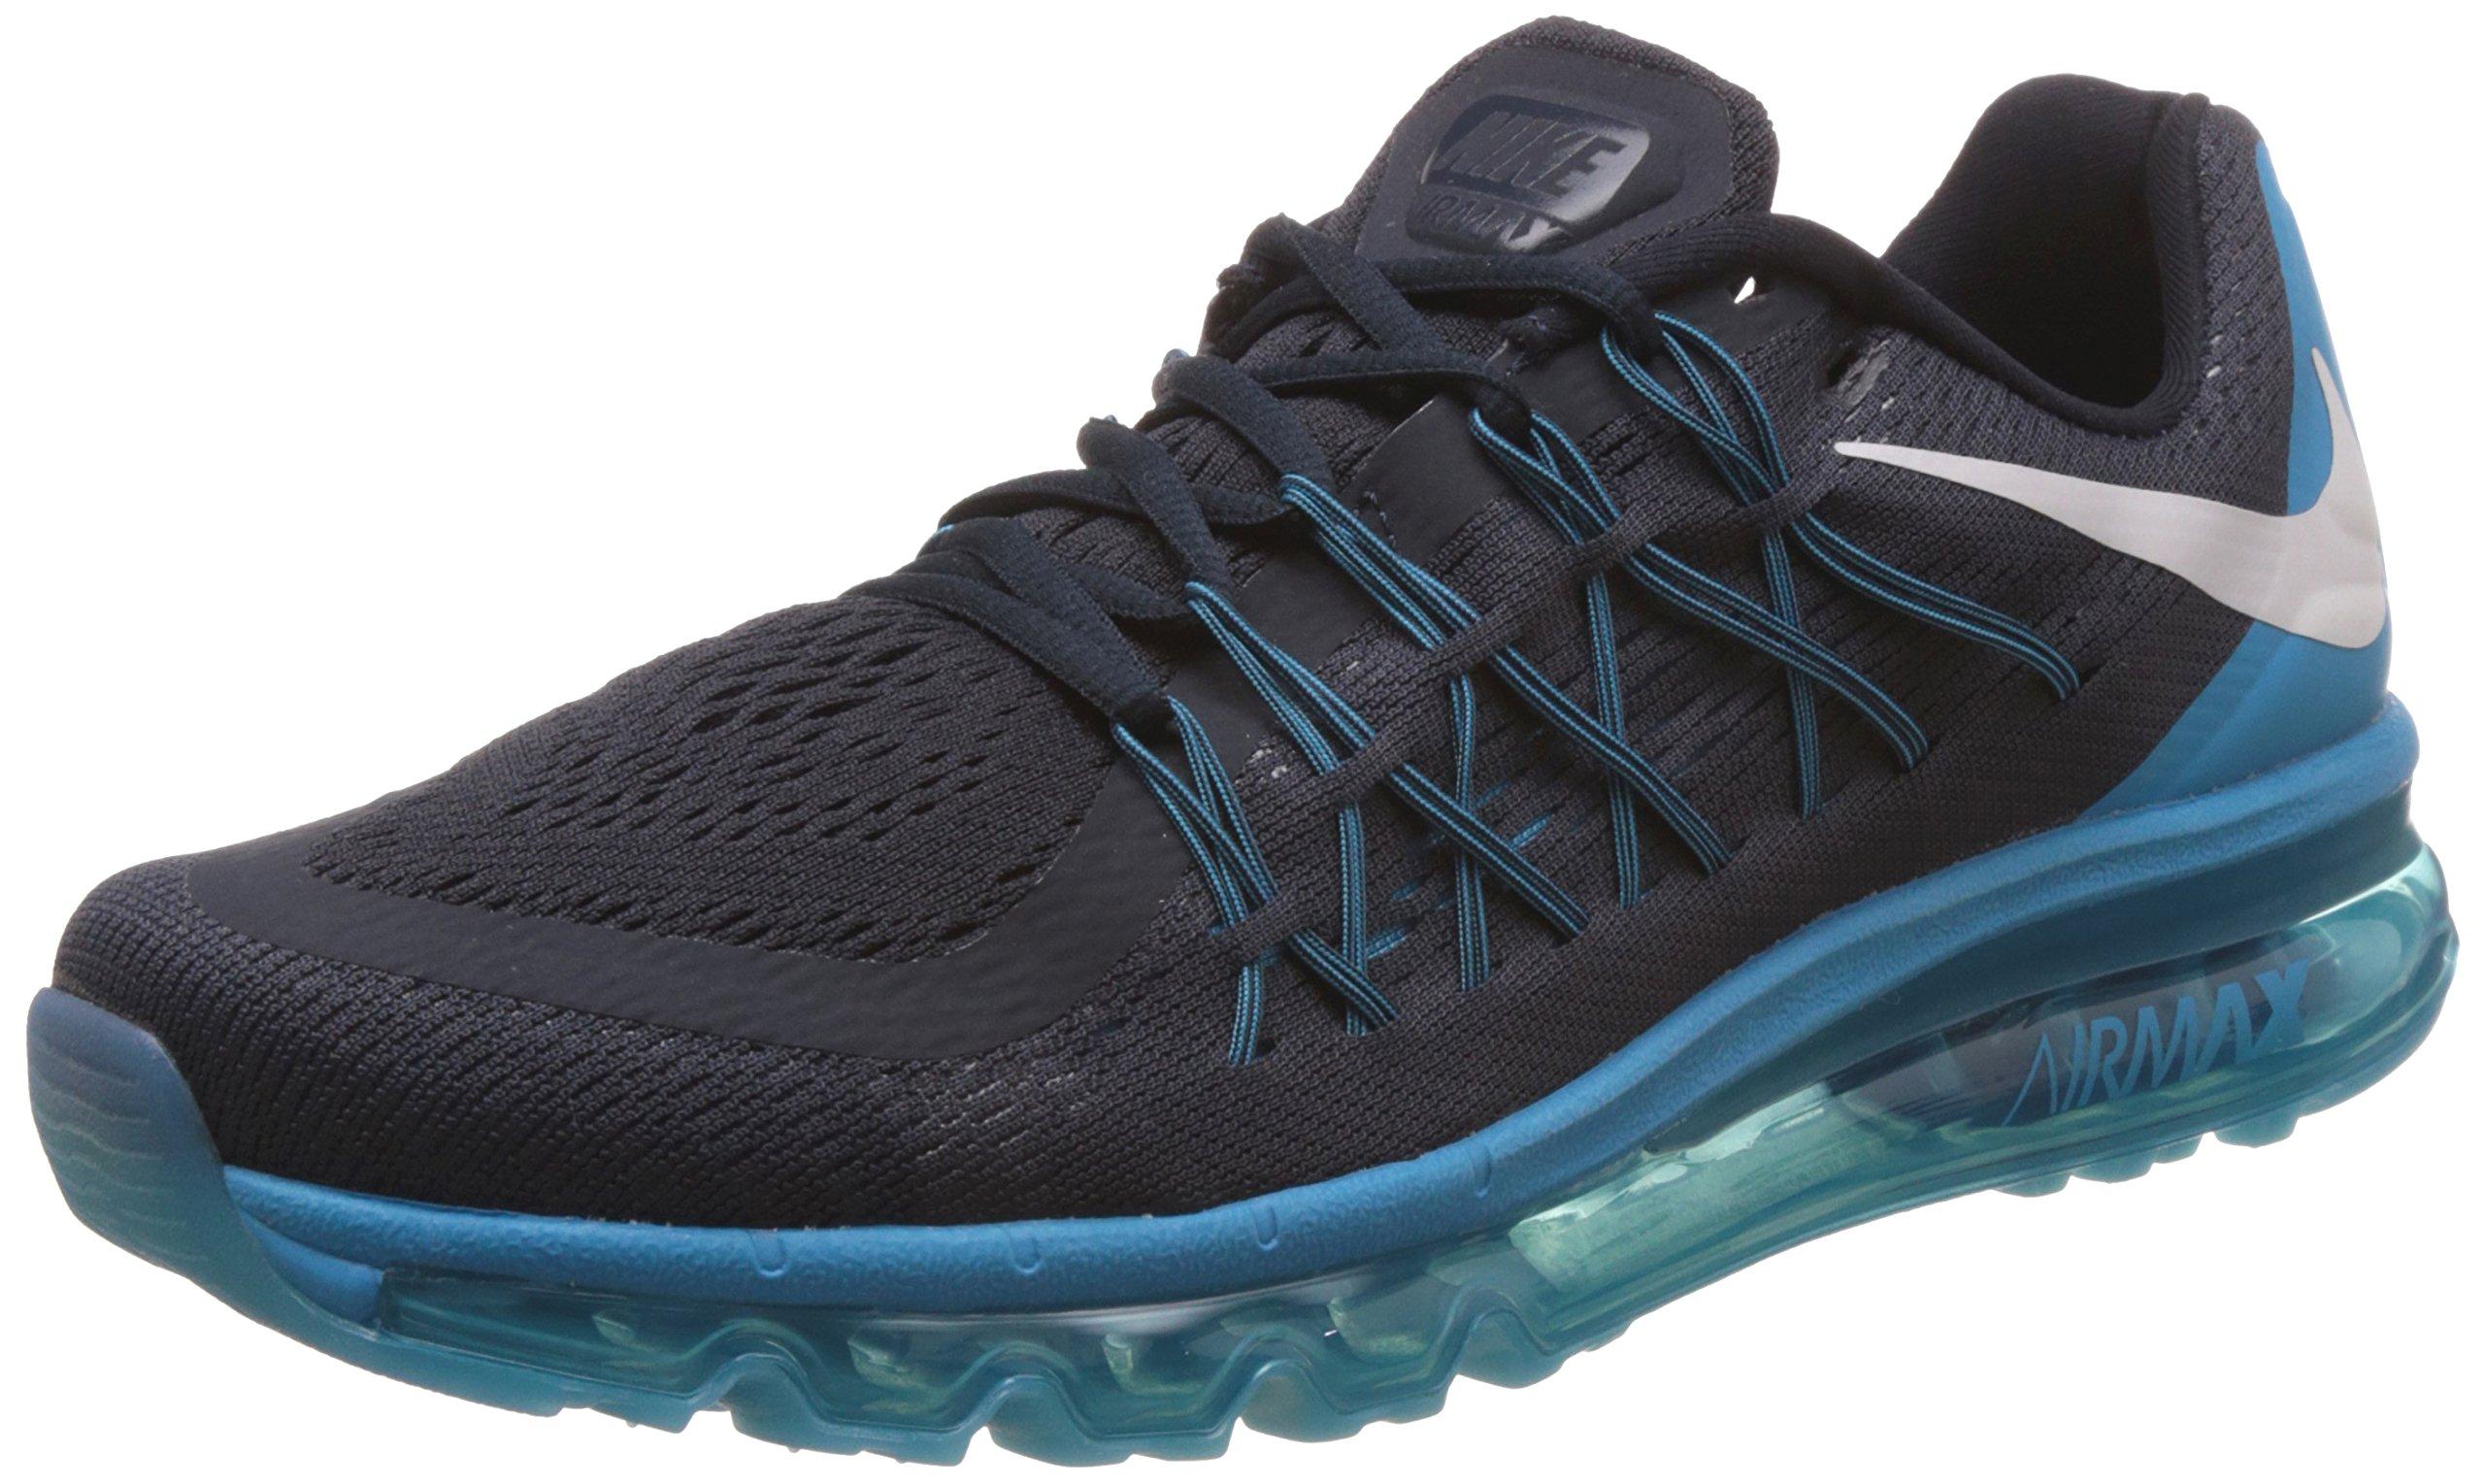 wholesale dealer b62e1 4dab3 Galleon - Nike Air Max 2015 Mens Running Trainers 698902 Sneakers Shoes (UK  6 US 7 EU 40, Dark Obsidian White Blue Legion 402)